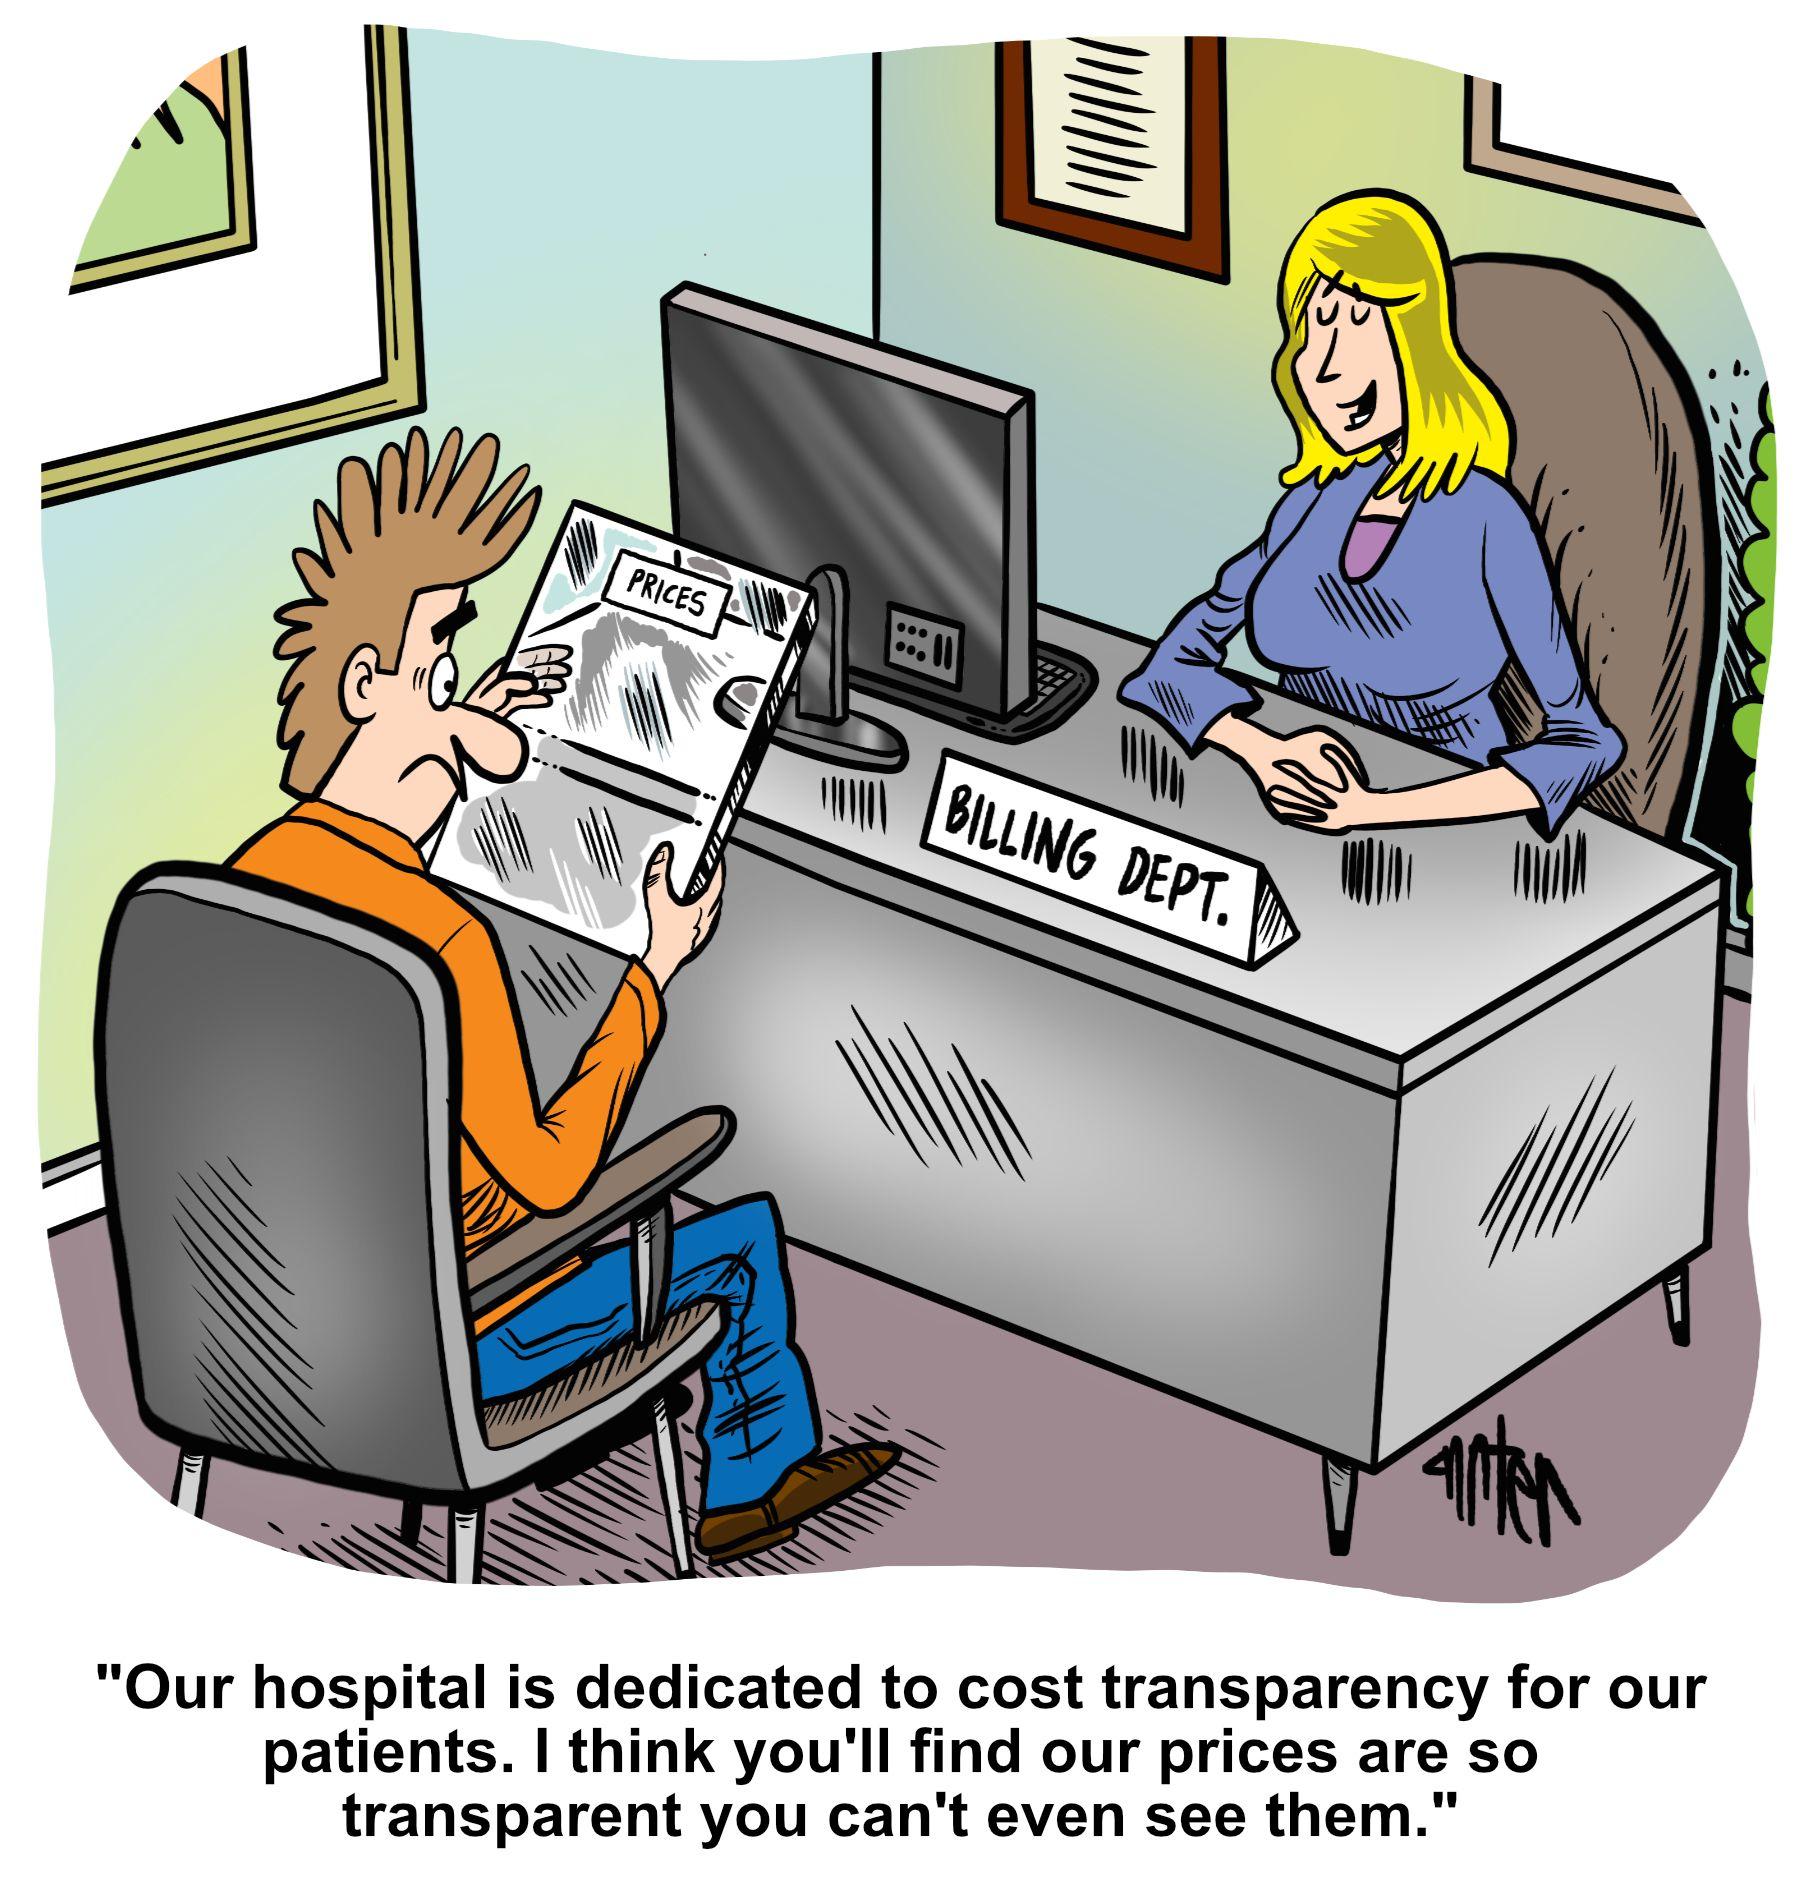 Medical Economics Cartoon: Price transparency